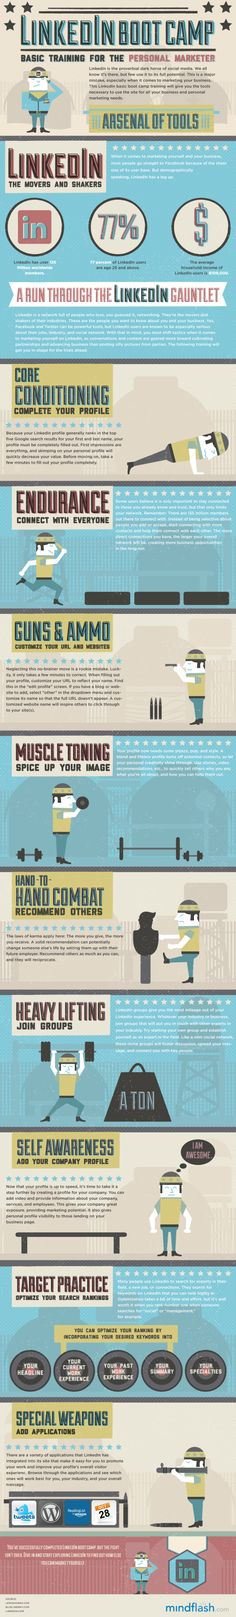 Linkedin Bootcamp #infografia #infographic #socialmedia